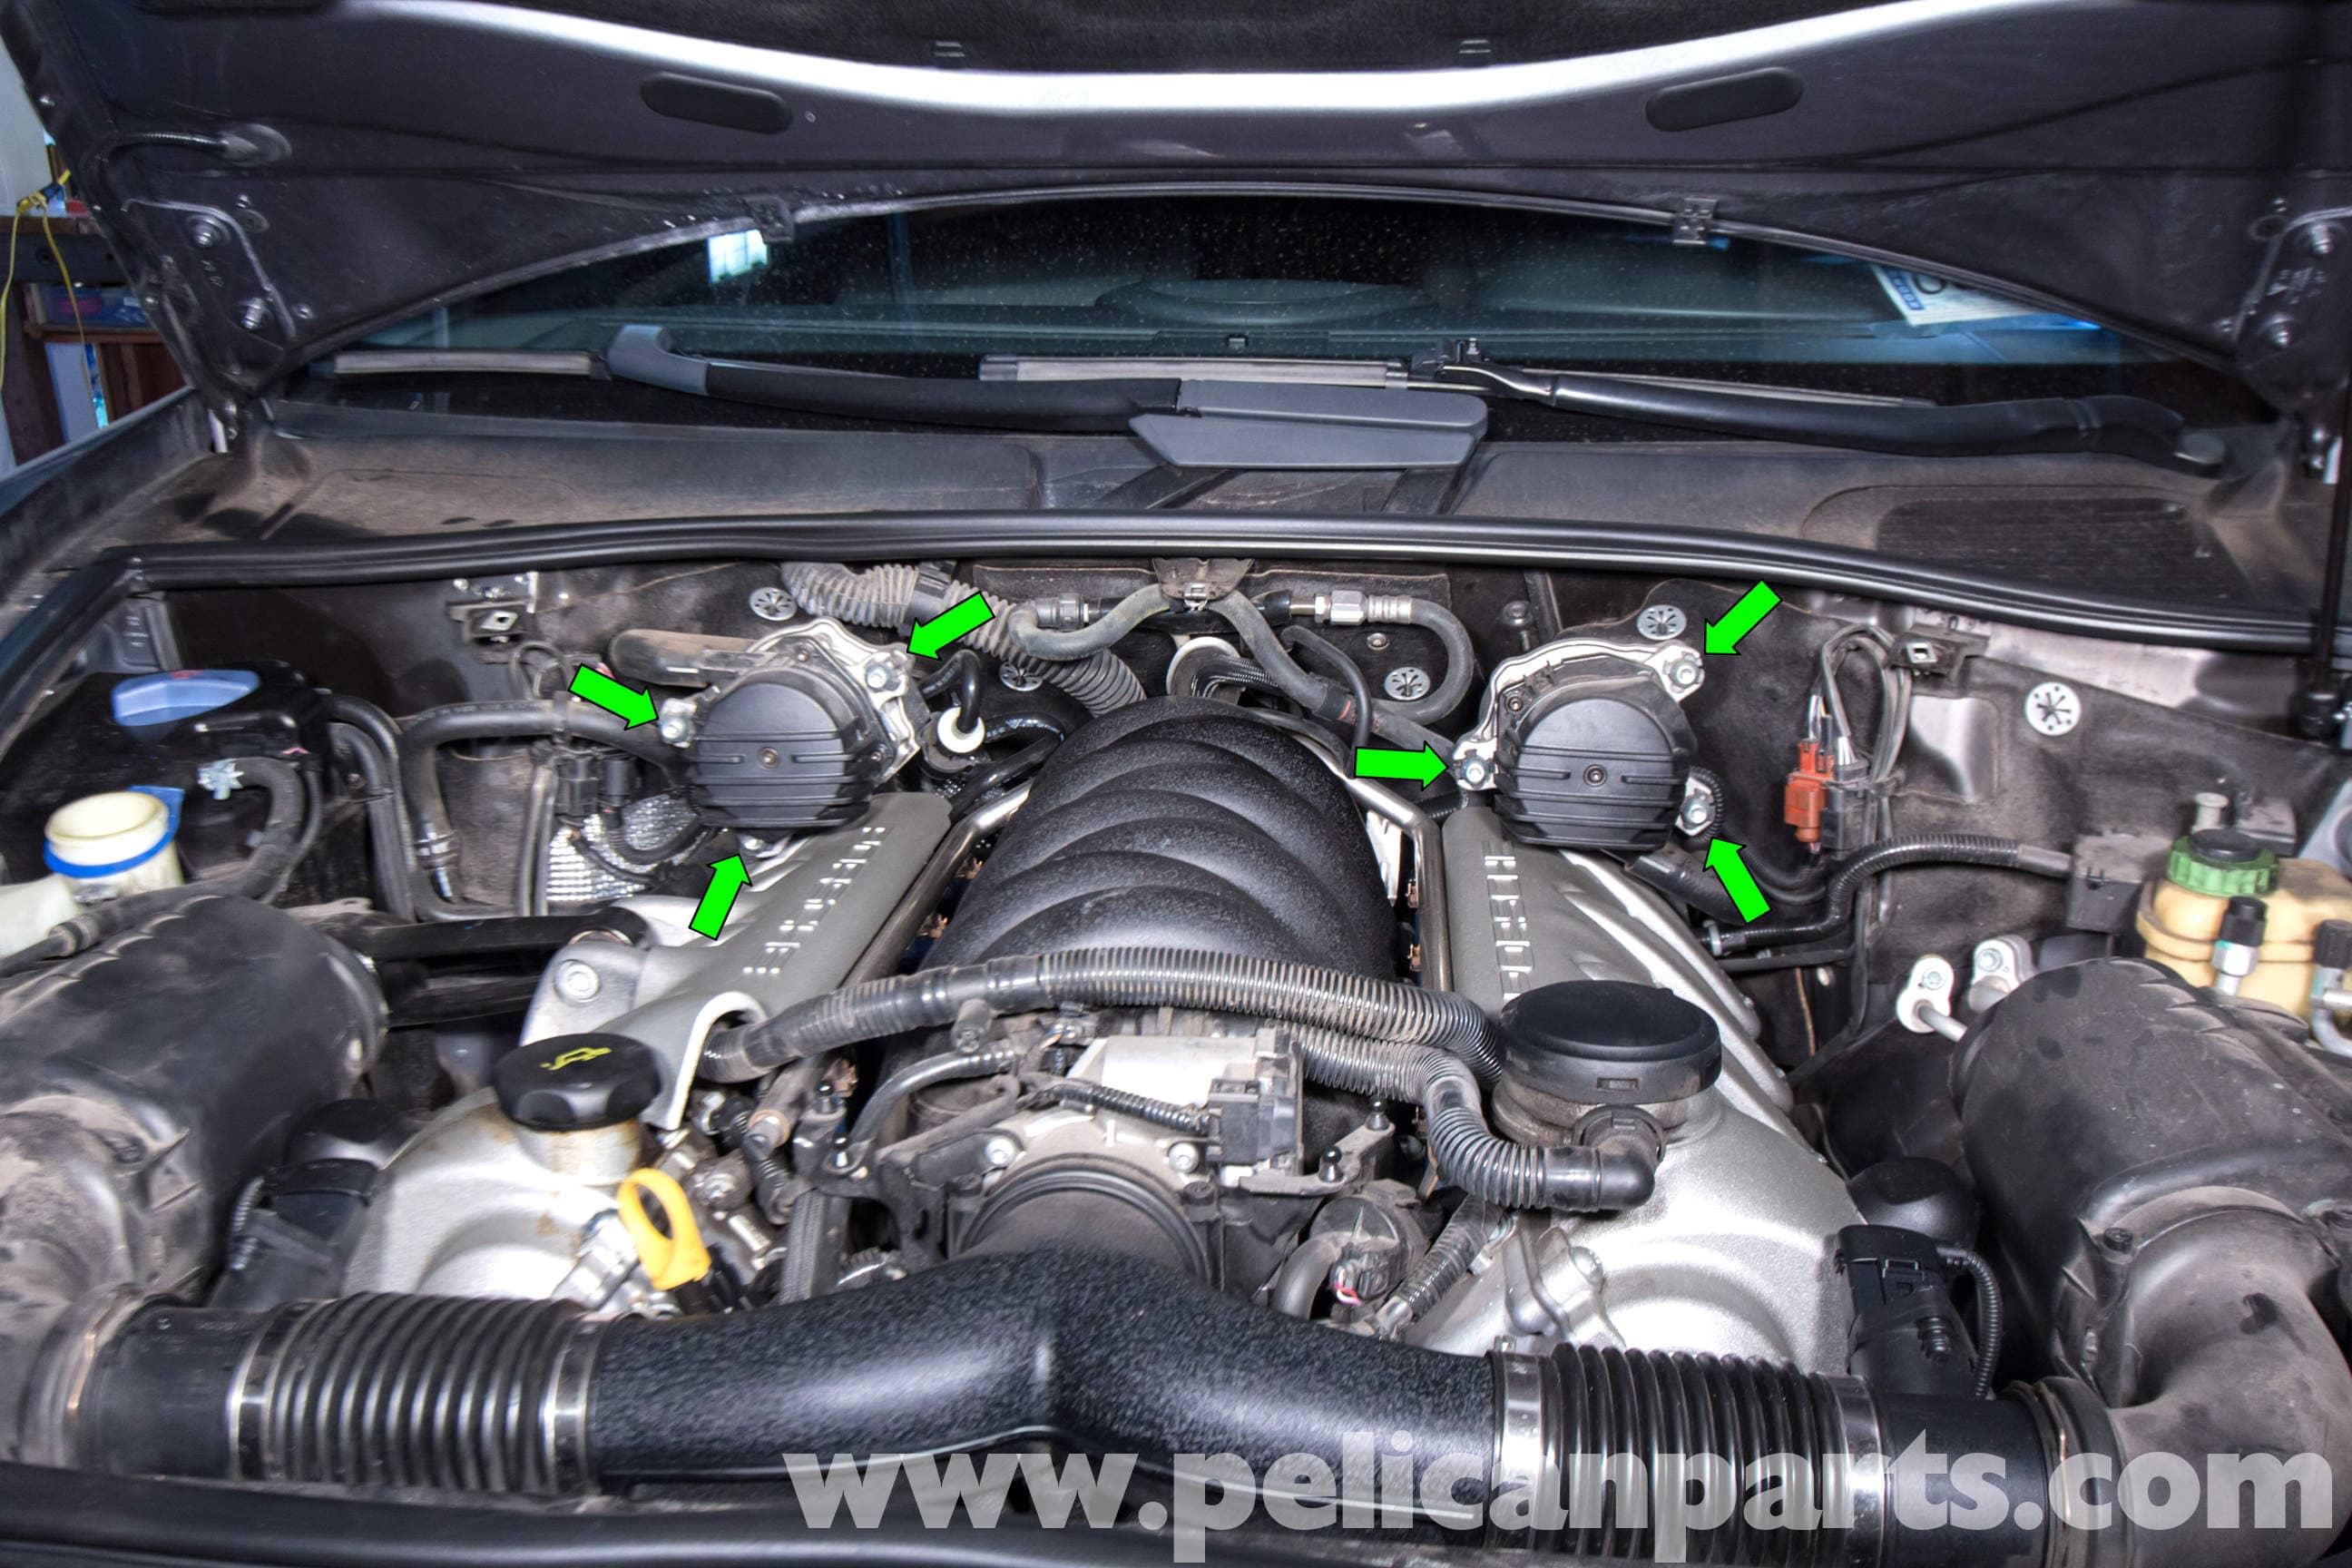 pic01?resize\=665%2C443 cayenne fuse box 2007 f150 fuse box diagram \u2022 wiring diagrams porsche cayenne fuse box location at reclaimingppi.co